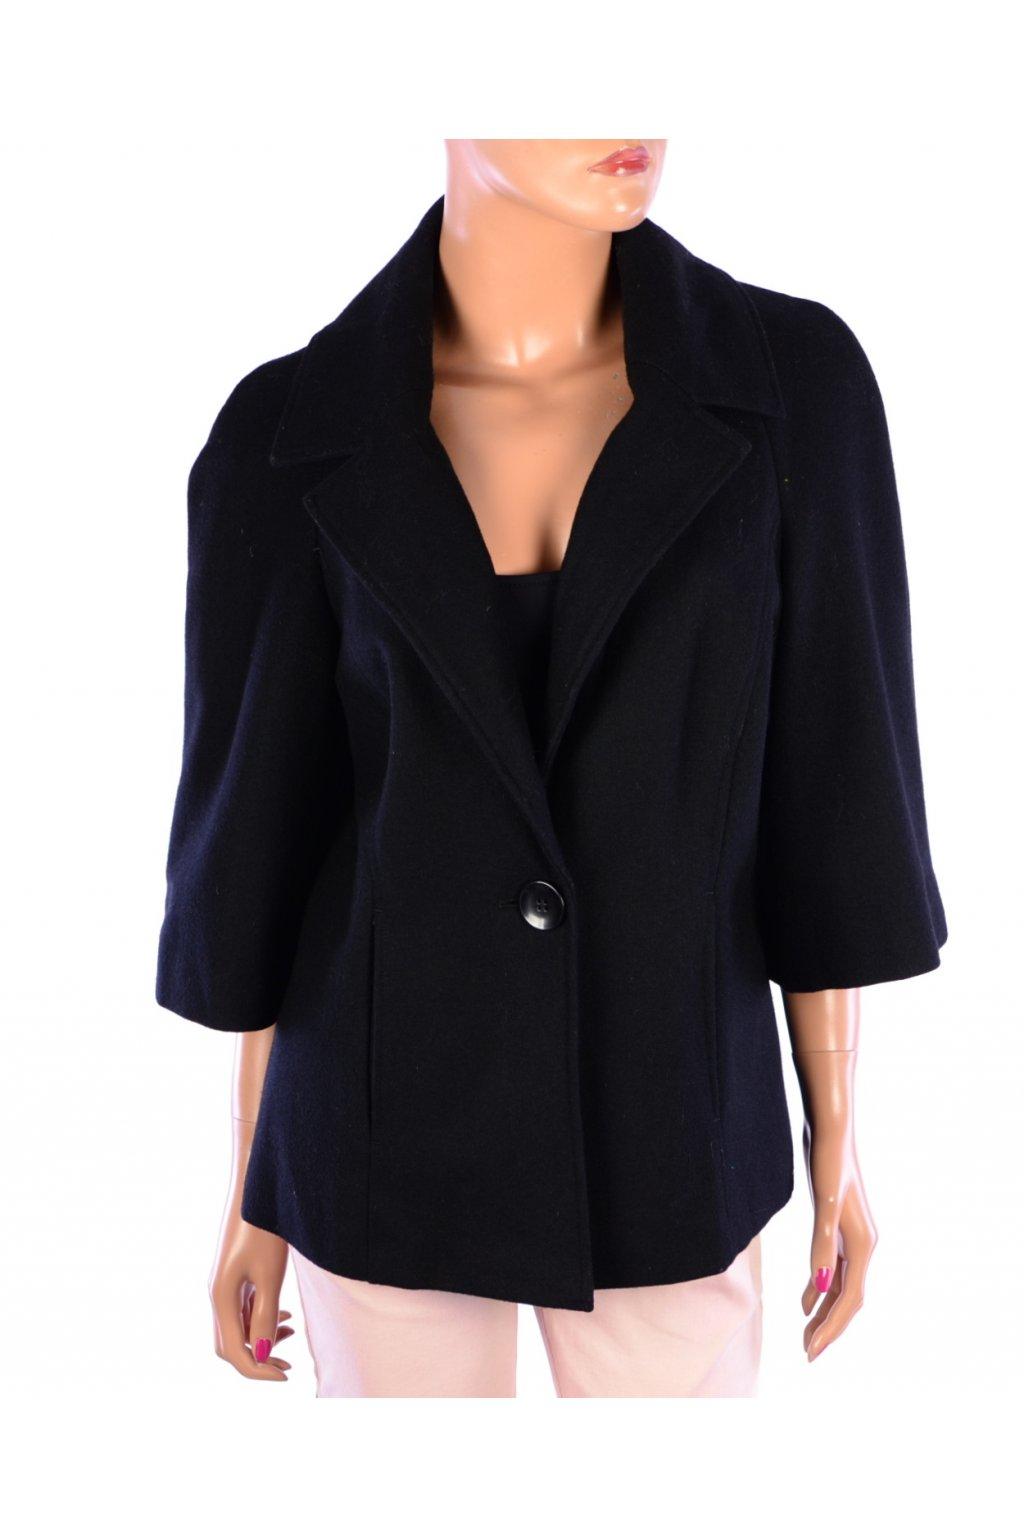 Kabátek černý lehký Vivien Caron vel. 40 / uk 14 / M 65% vlna